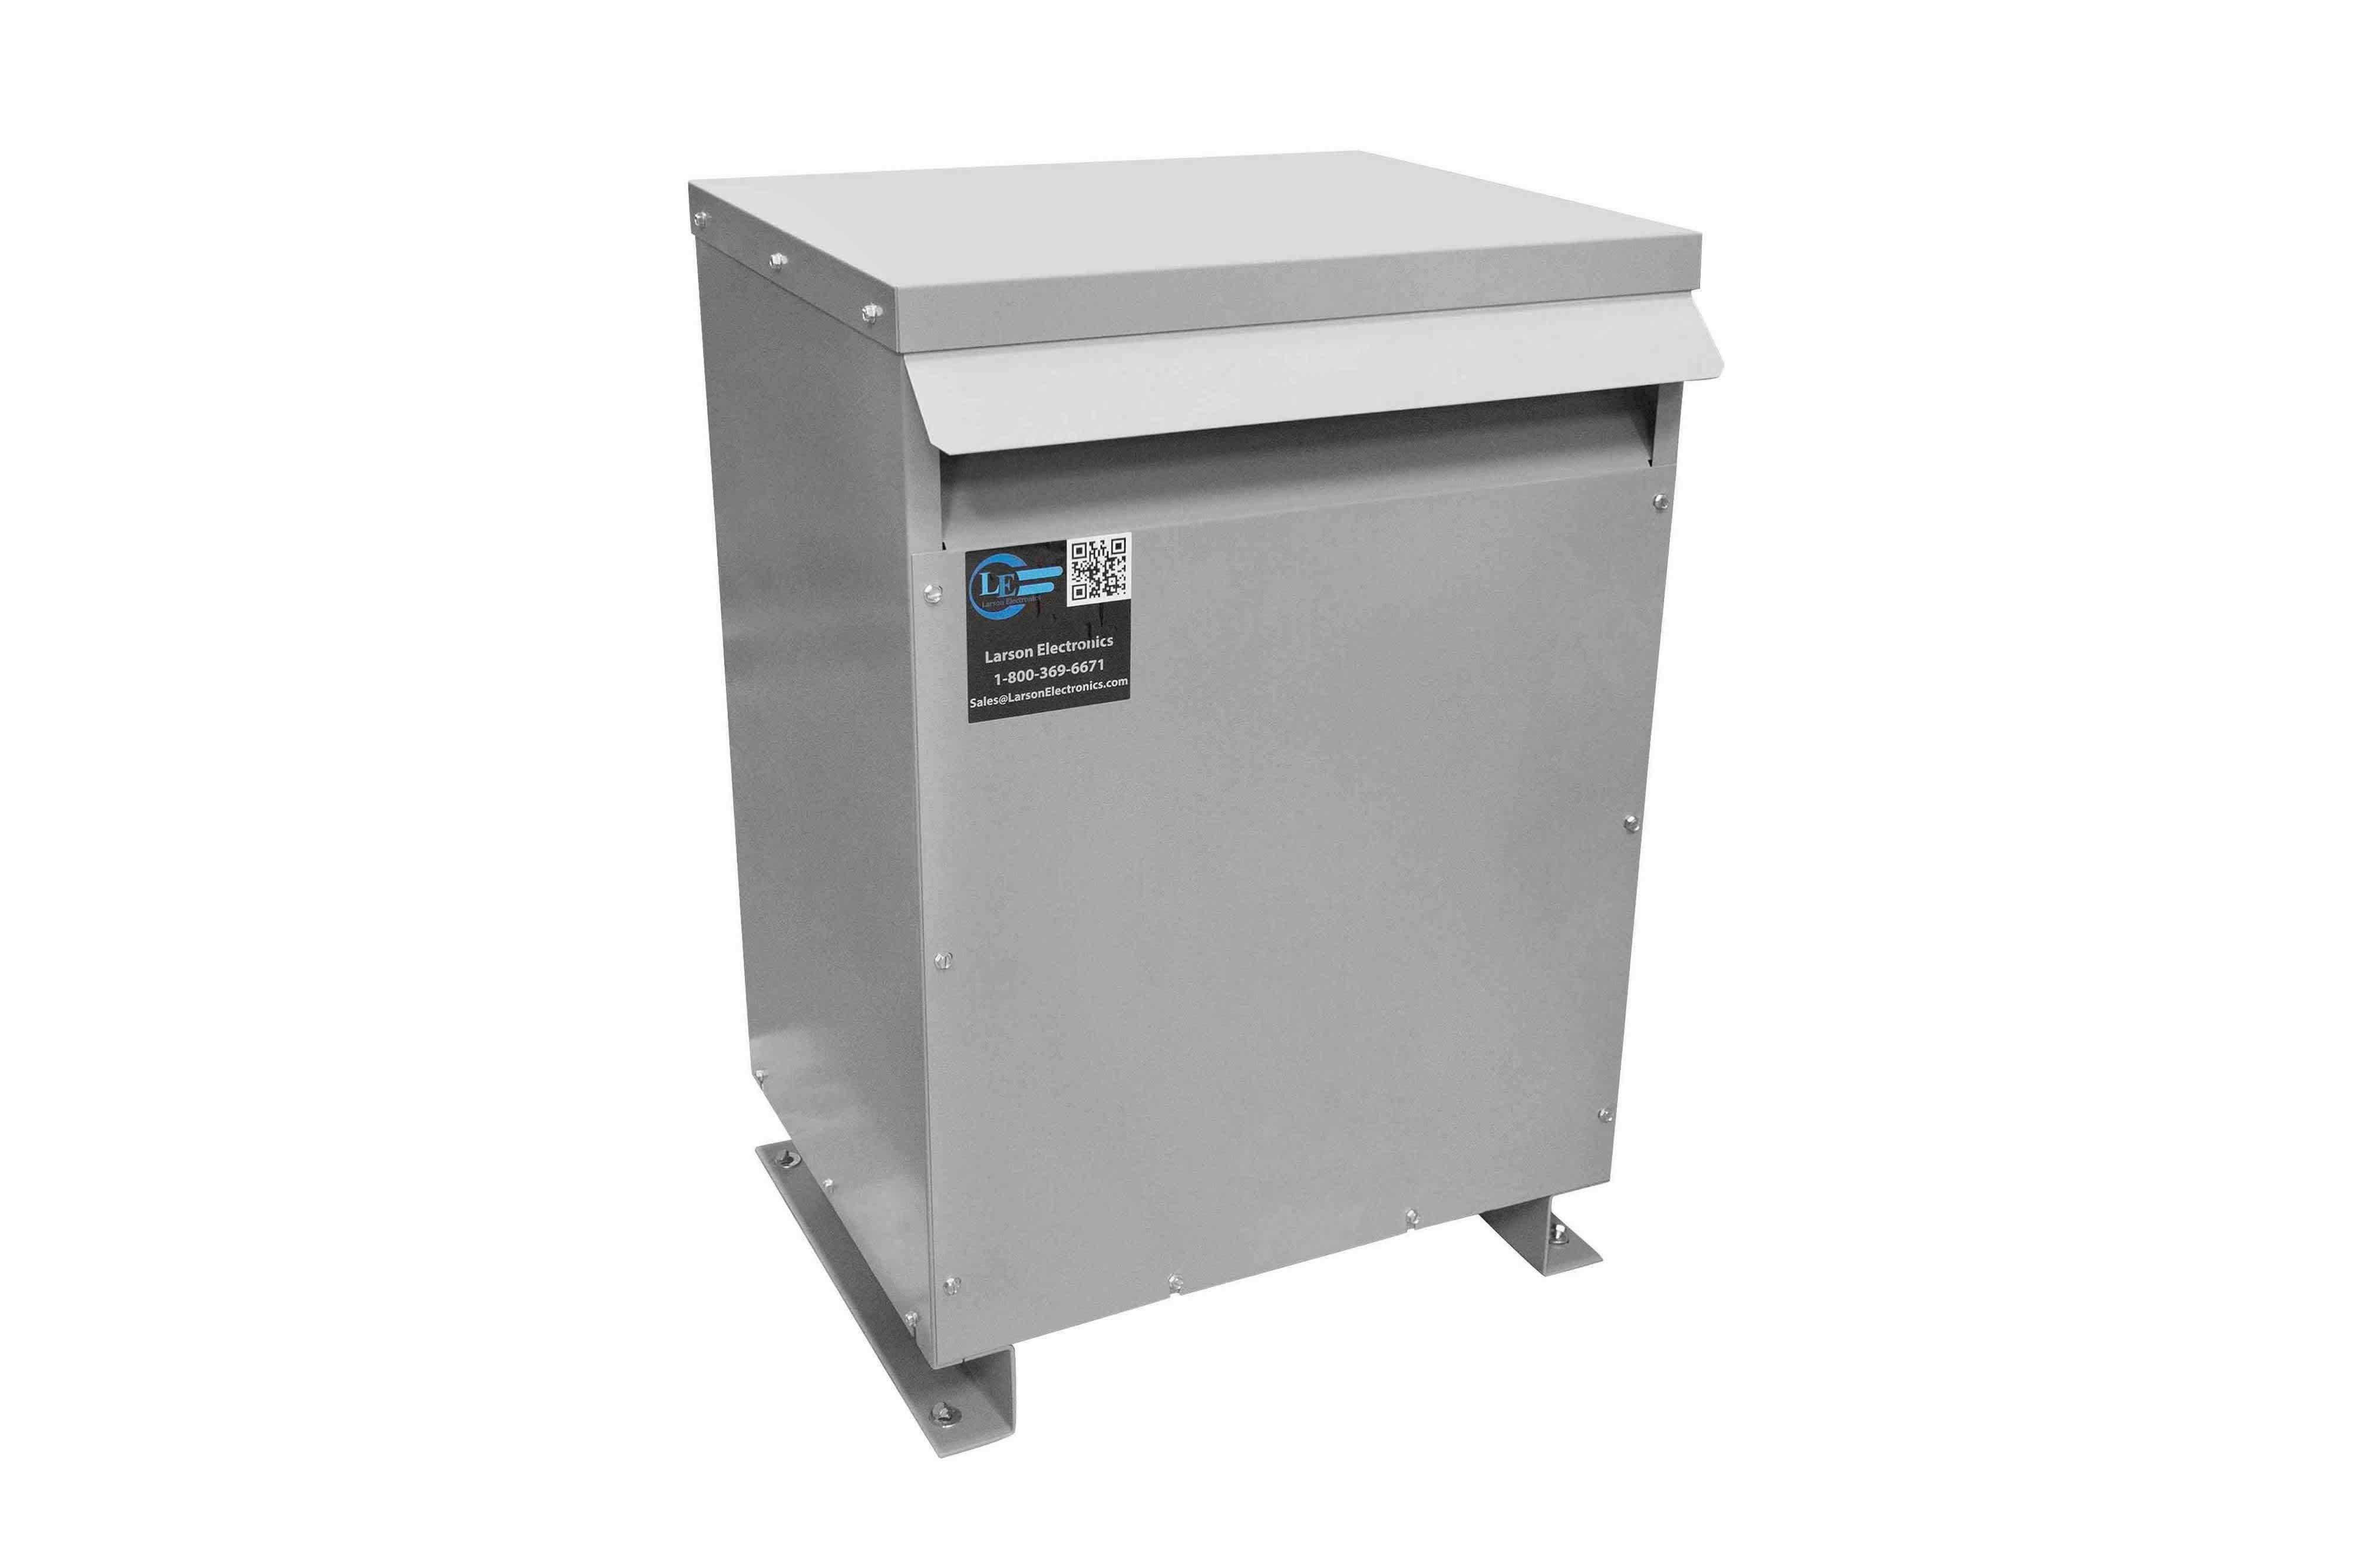 37.5 kVA 3PH Isolation Transformer, 380V Wye Primary, 208V Delta Secondary, N3R, Ventilated, 60 Hz